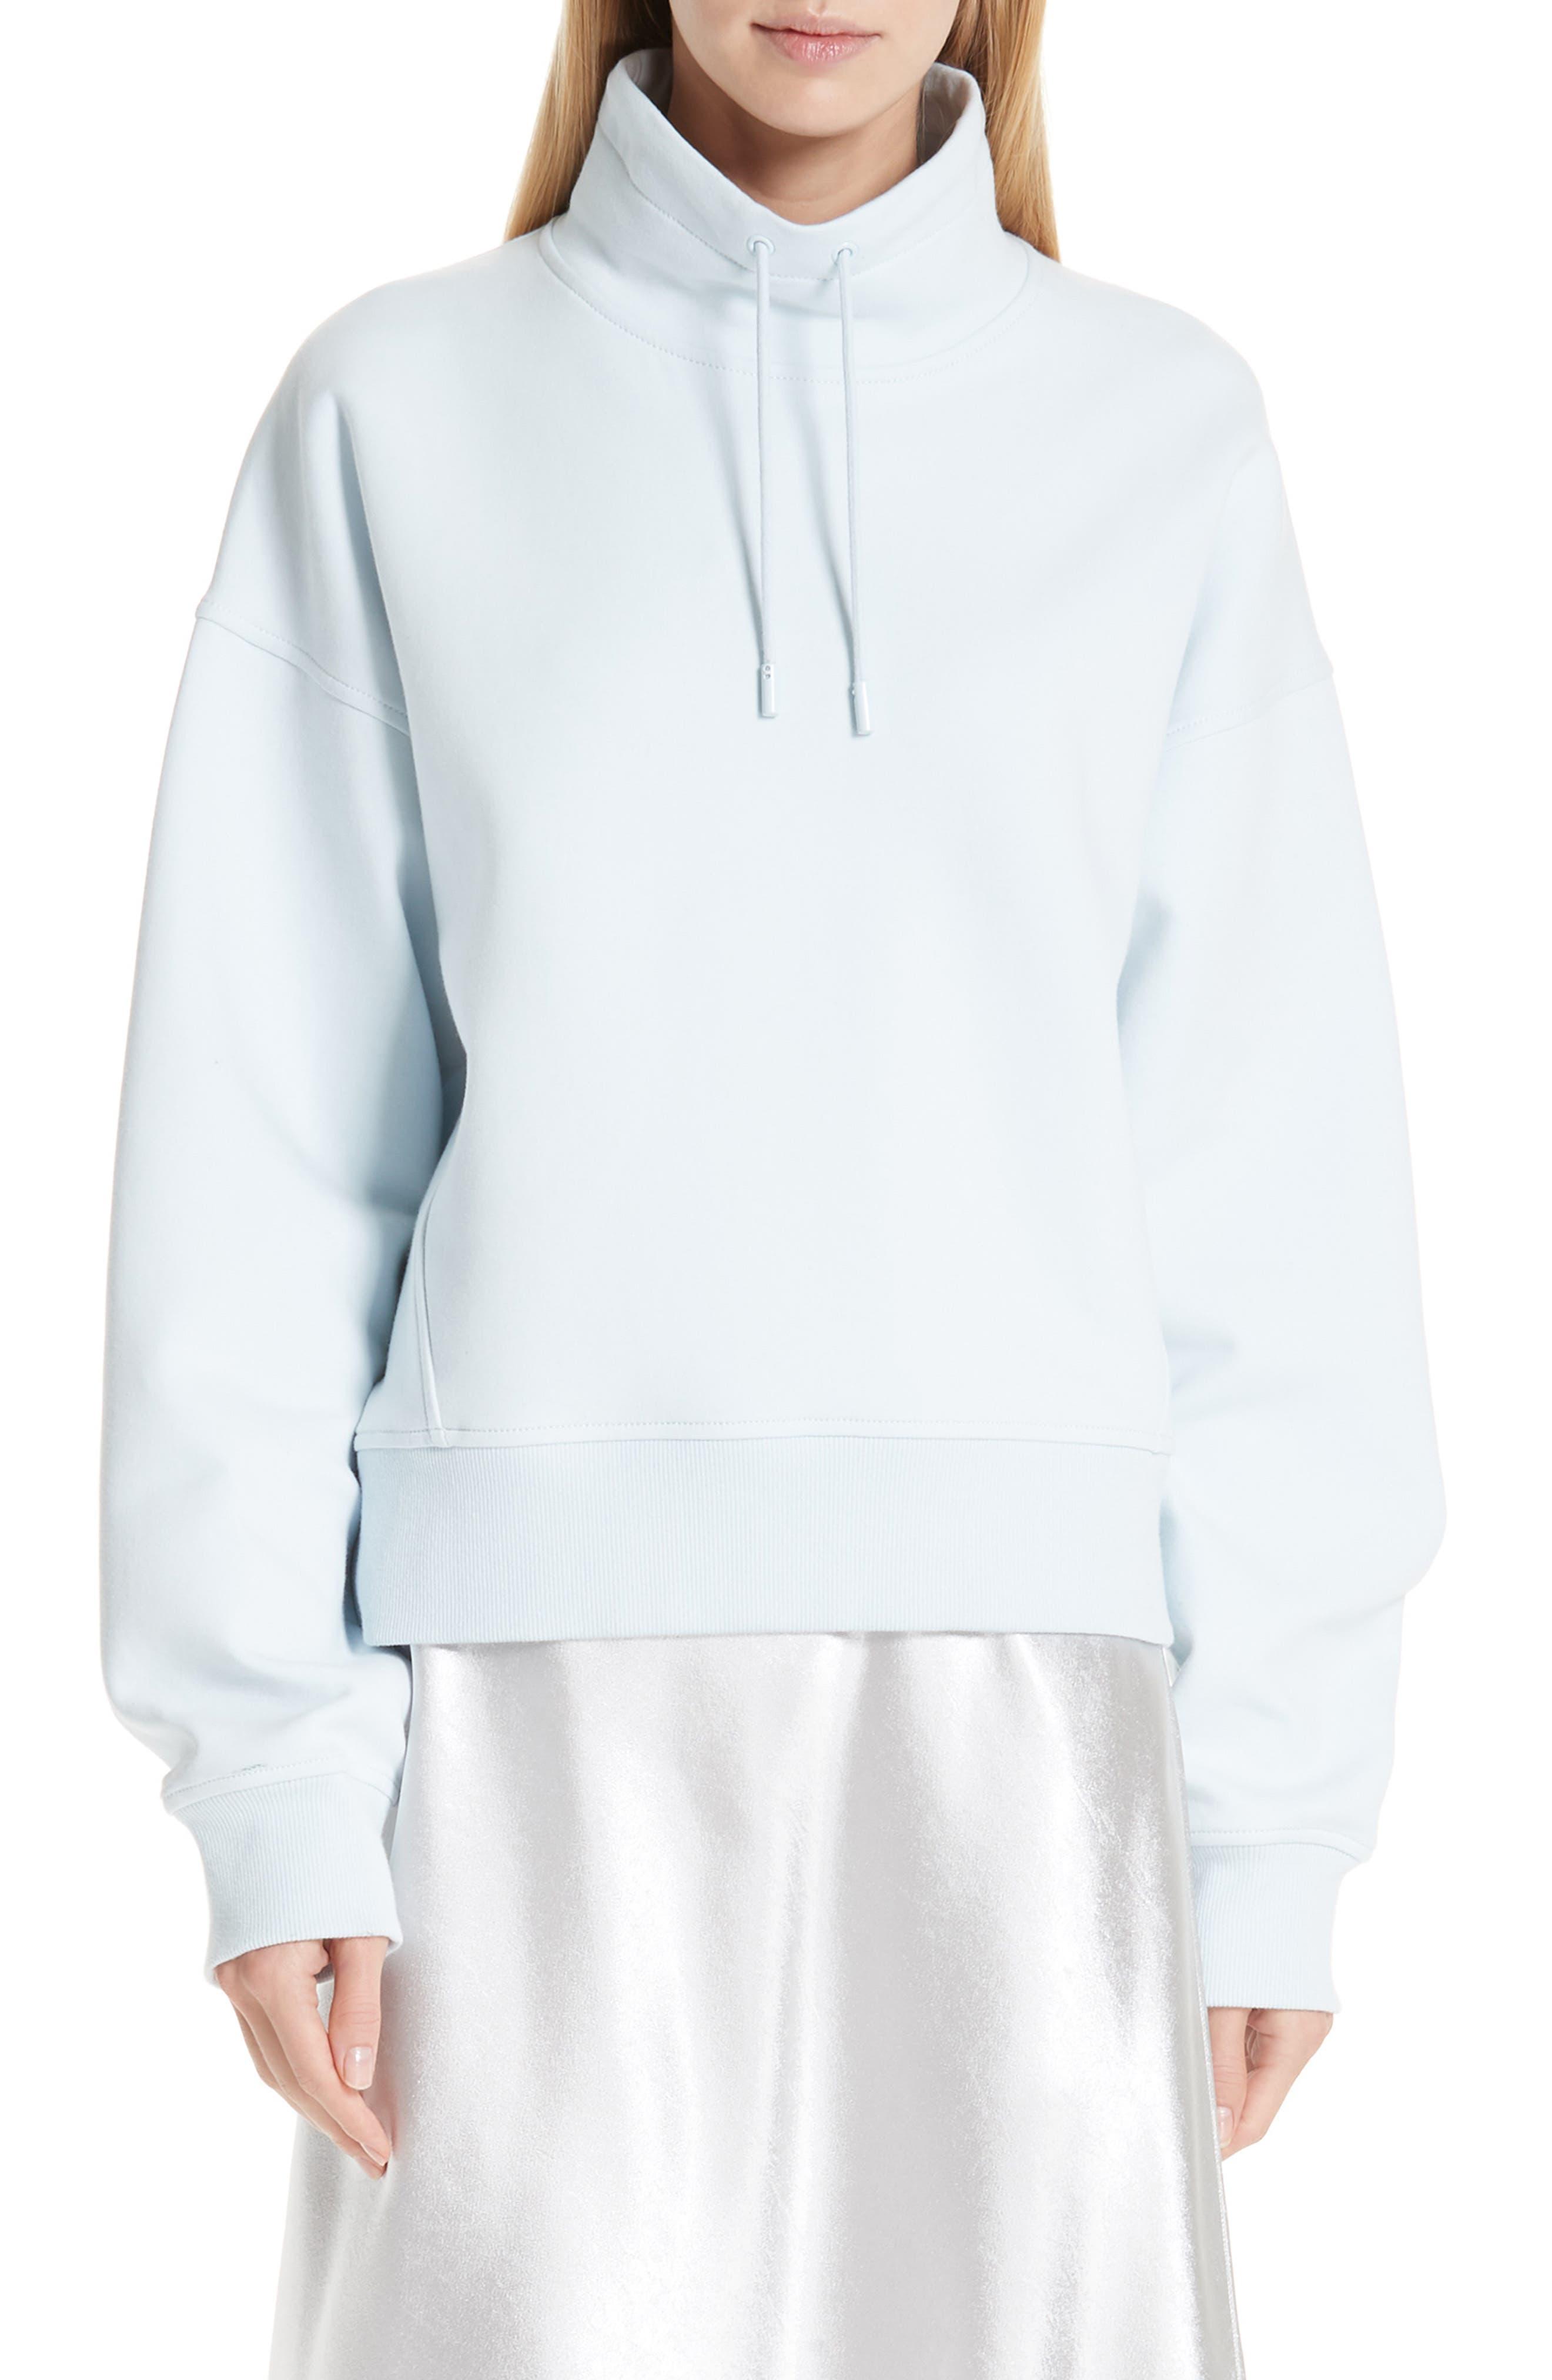 7d6d4b3a9713 Women s Vince Sweatshirts   Hoodies